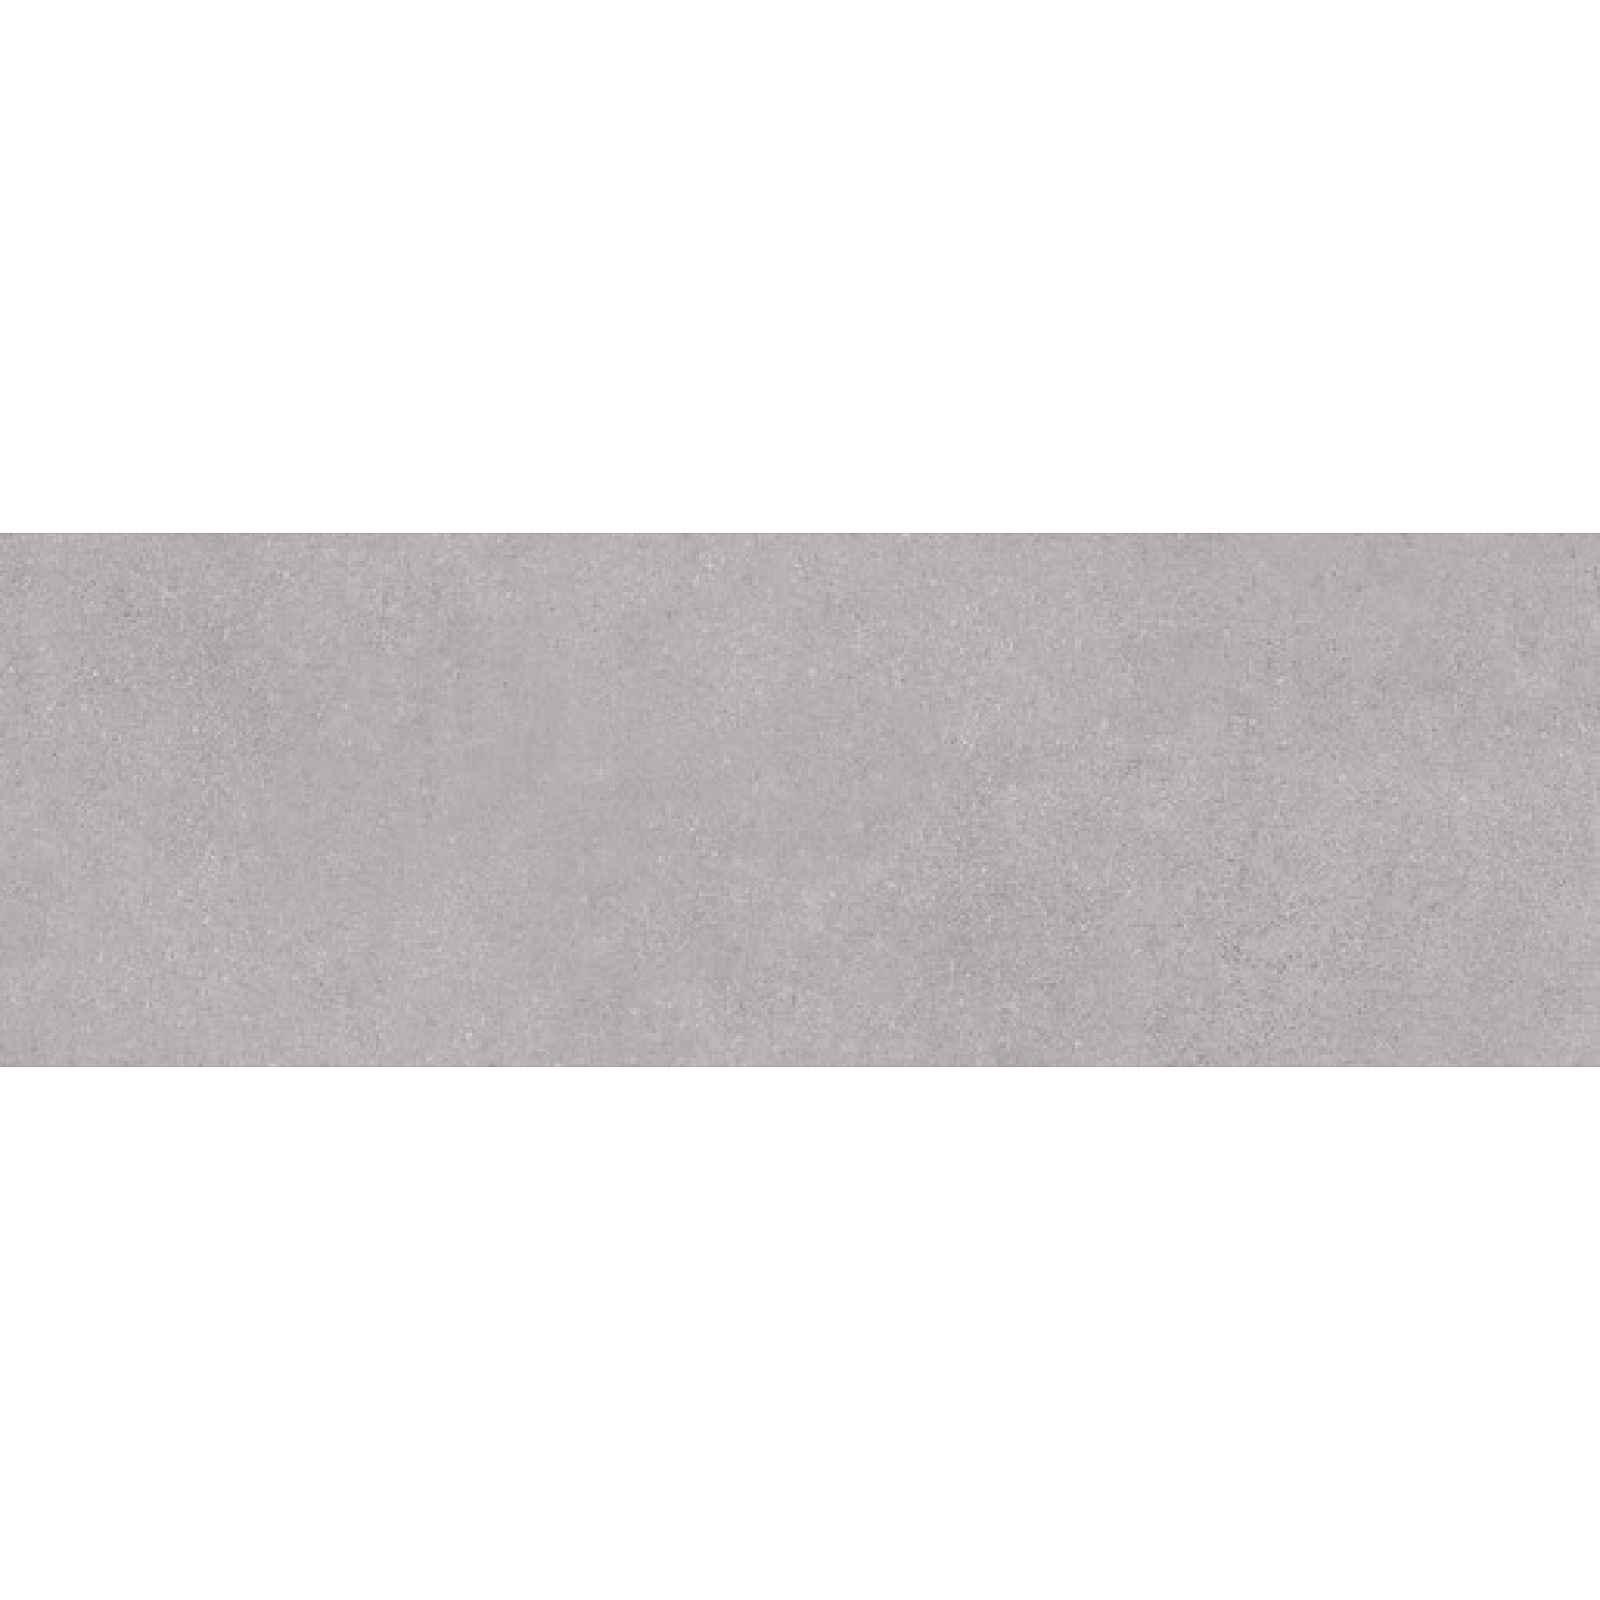 Obklad RAKO Form Plus tmavě šedá 20x60 cm mat WADVE697.1